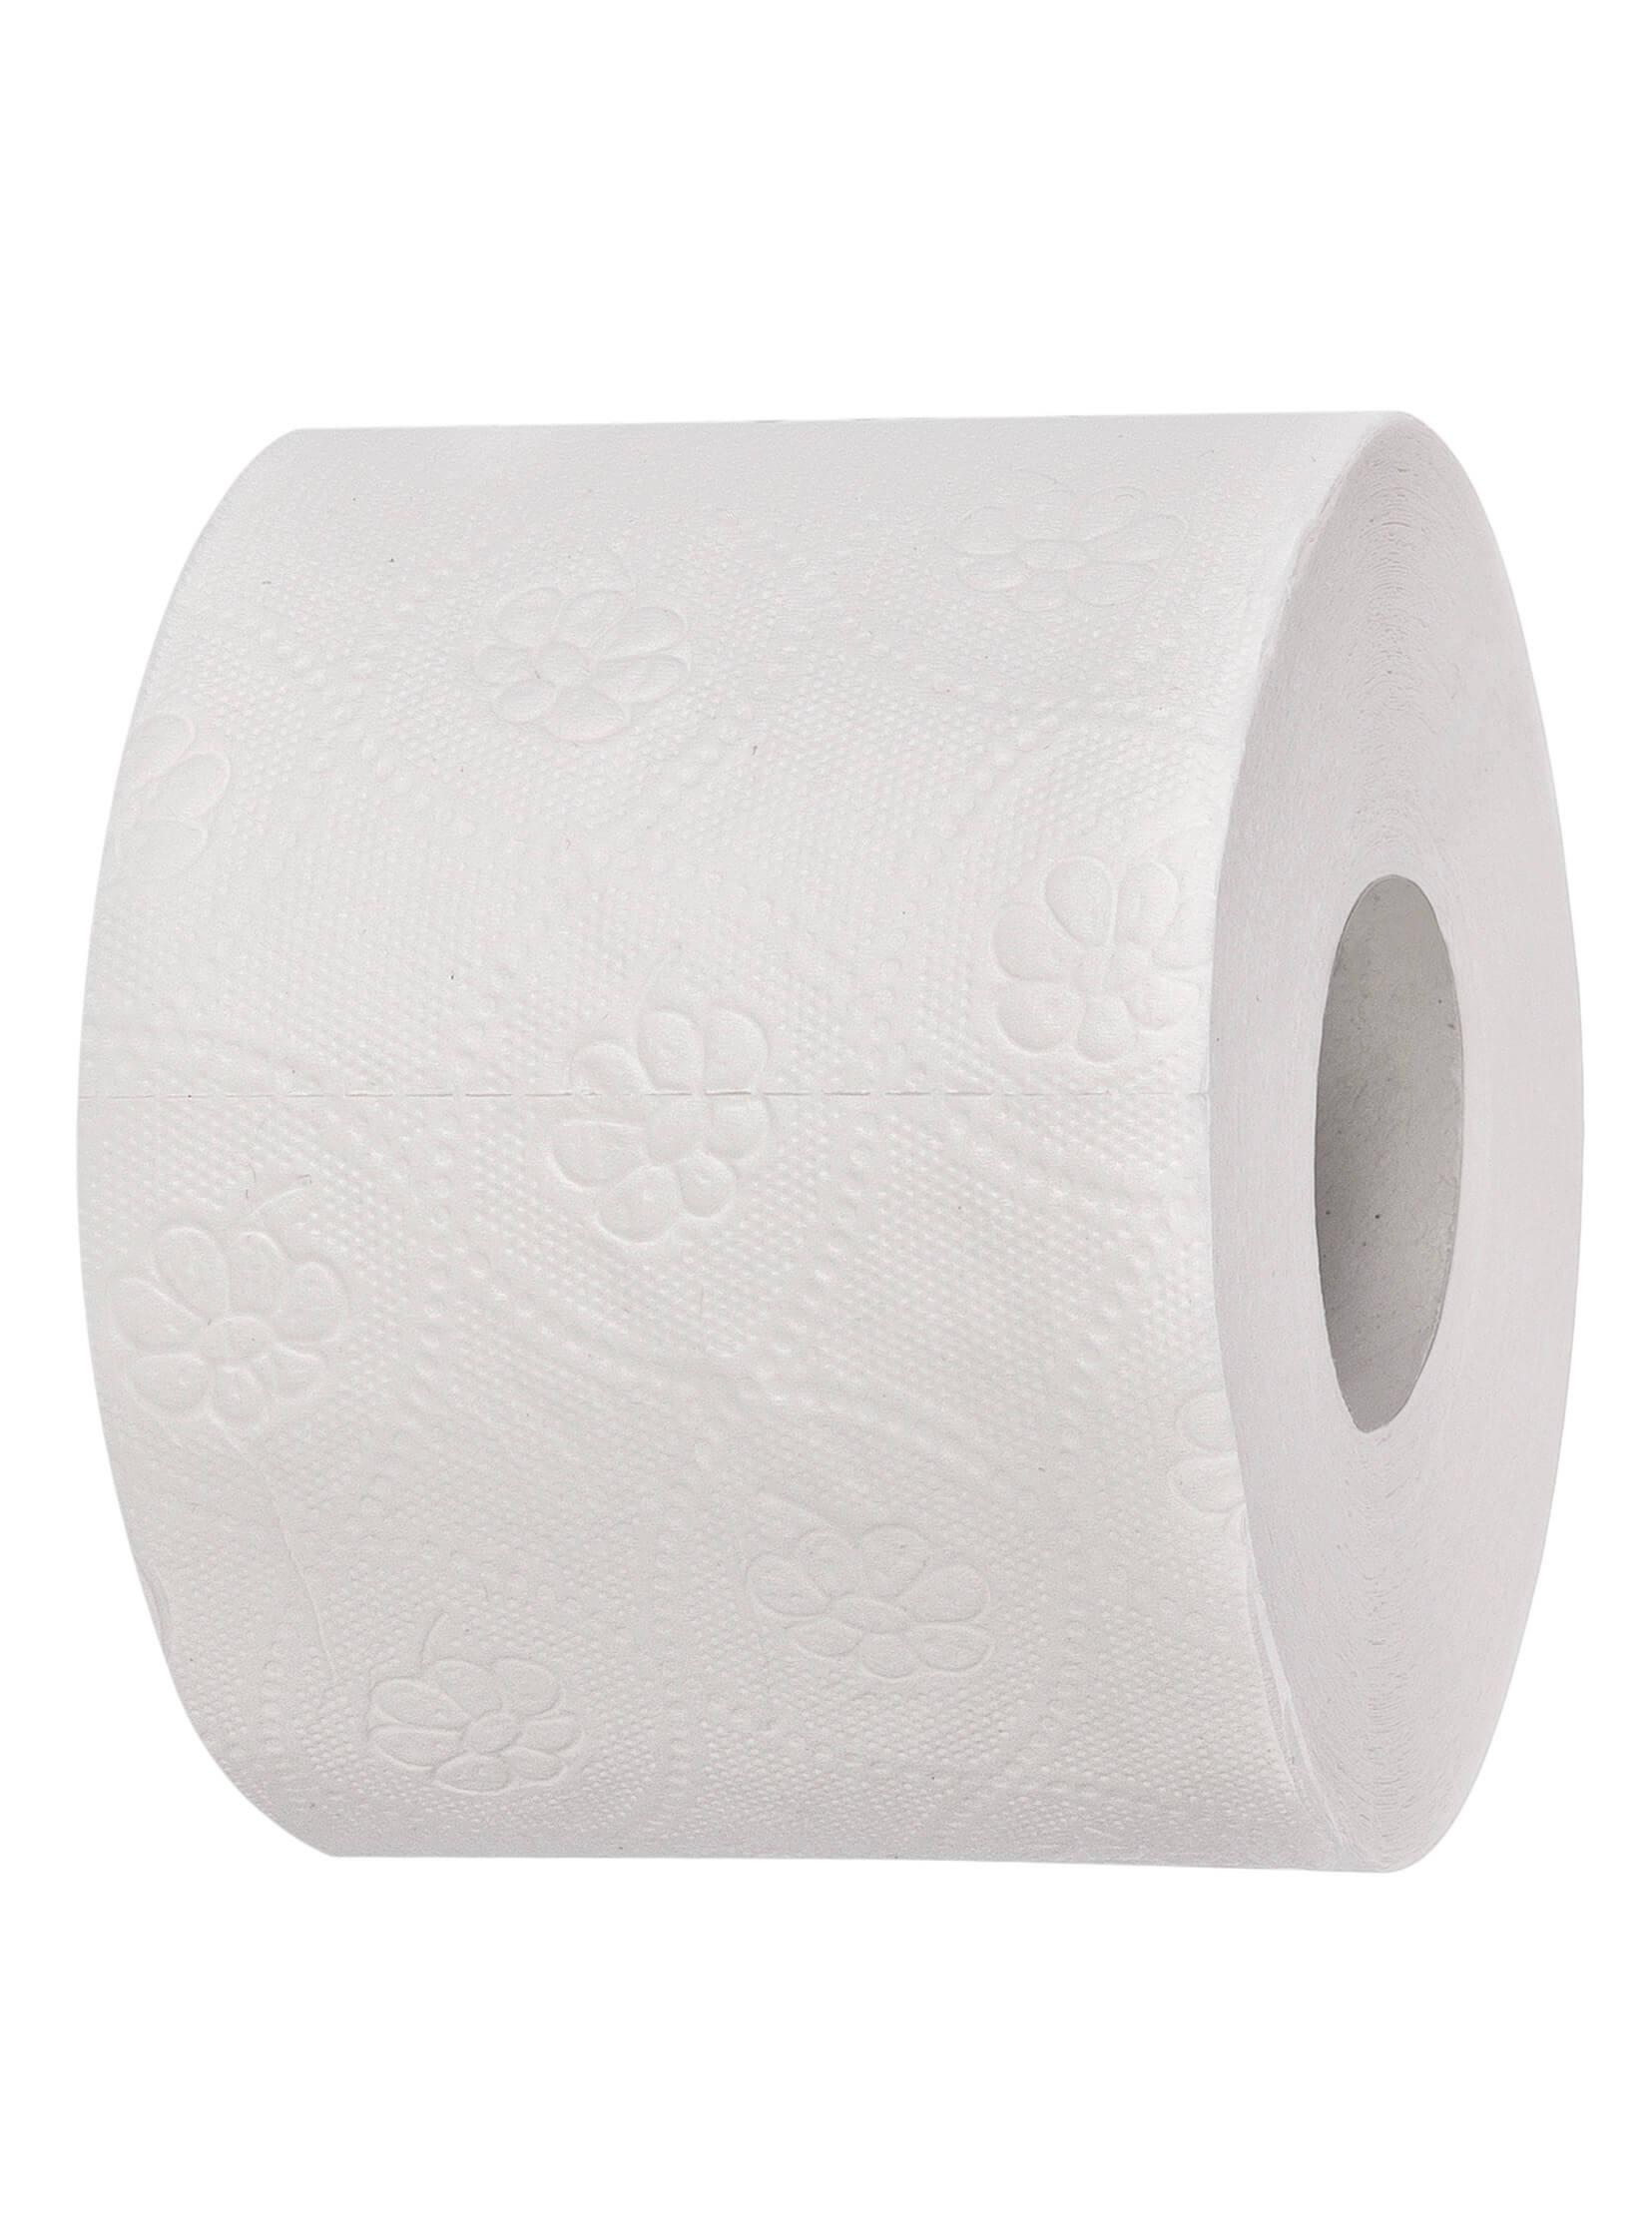 Toilettenpapier Premium | 3-lagig | 100% Zellstoff - 72 Rollen